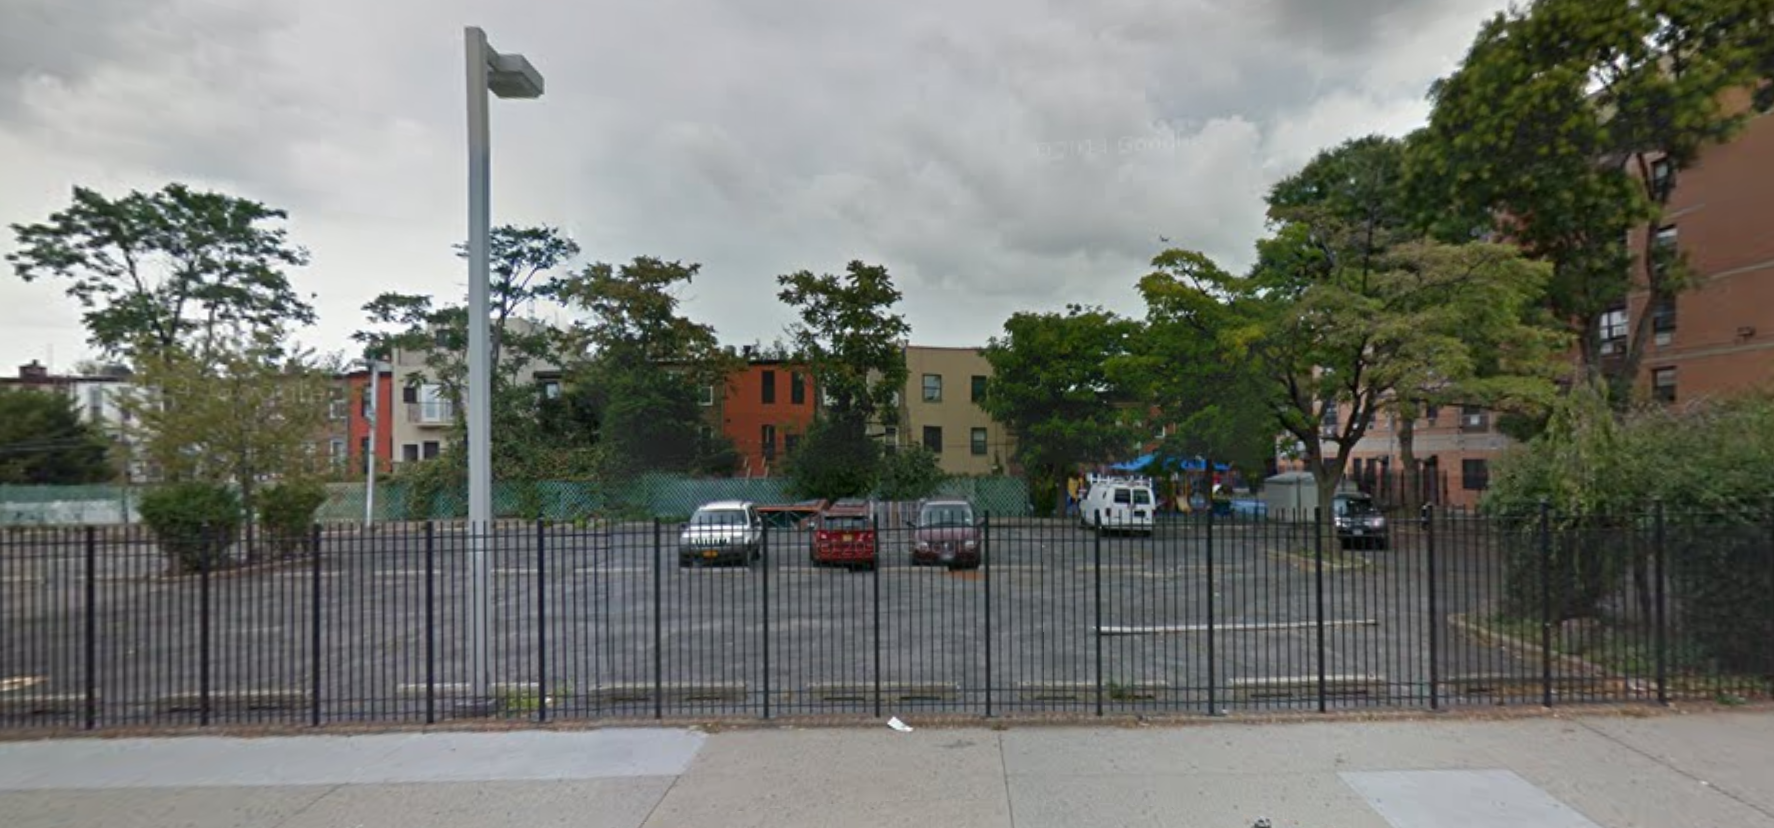 639 Gates Avenue, image via Google Maps